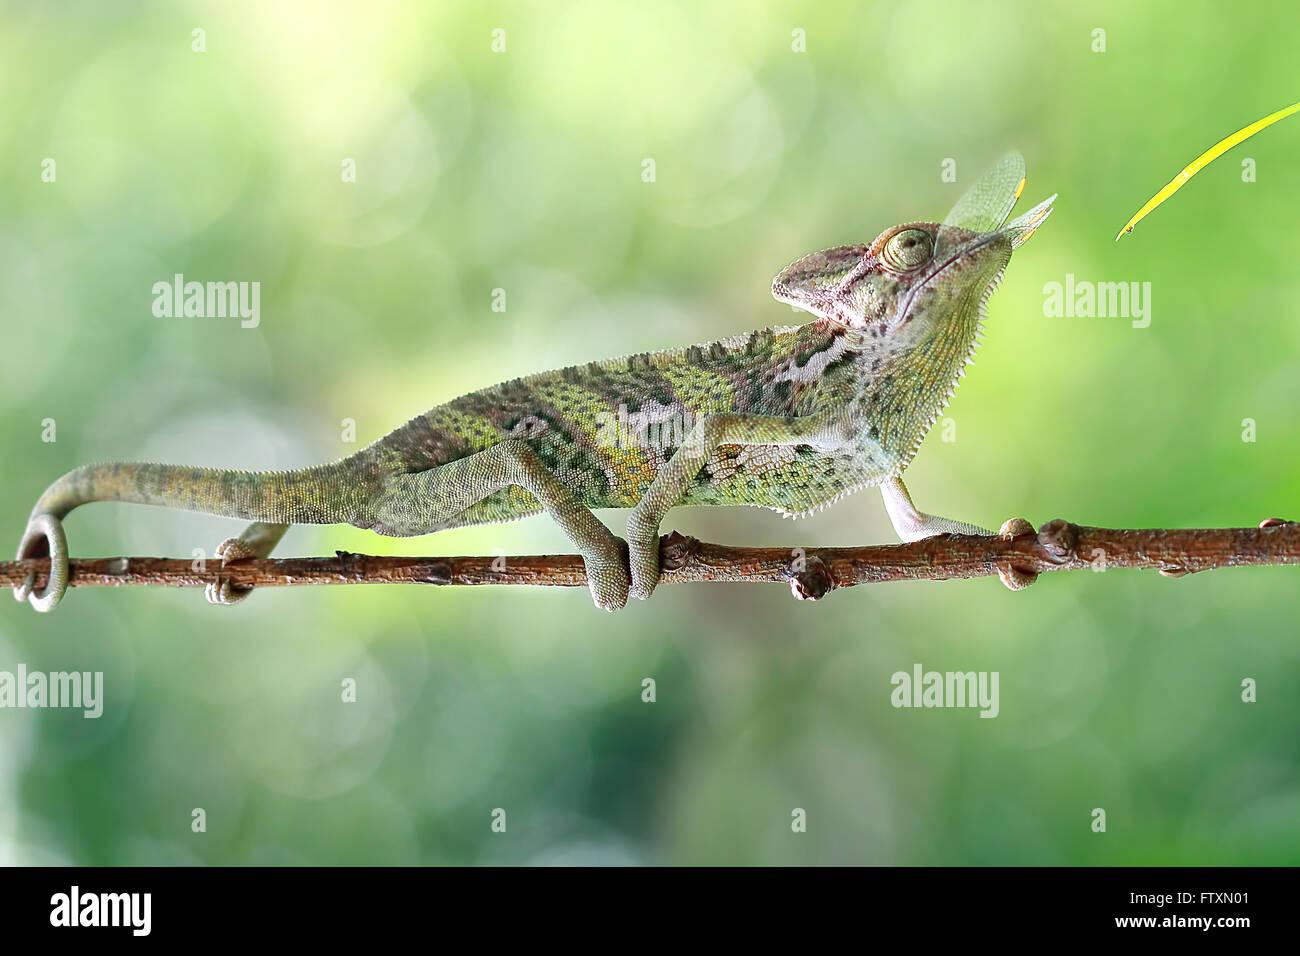 Vista lateral de un camaleón de comer un insecto, Indonesia Foto de stock